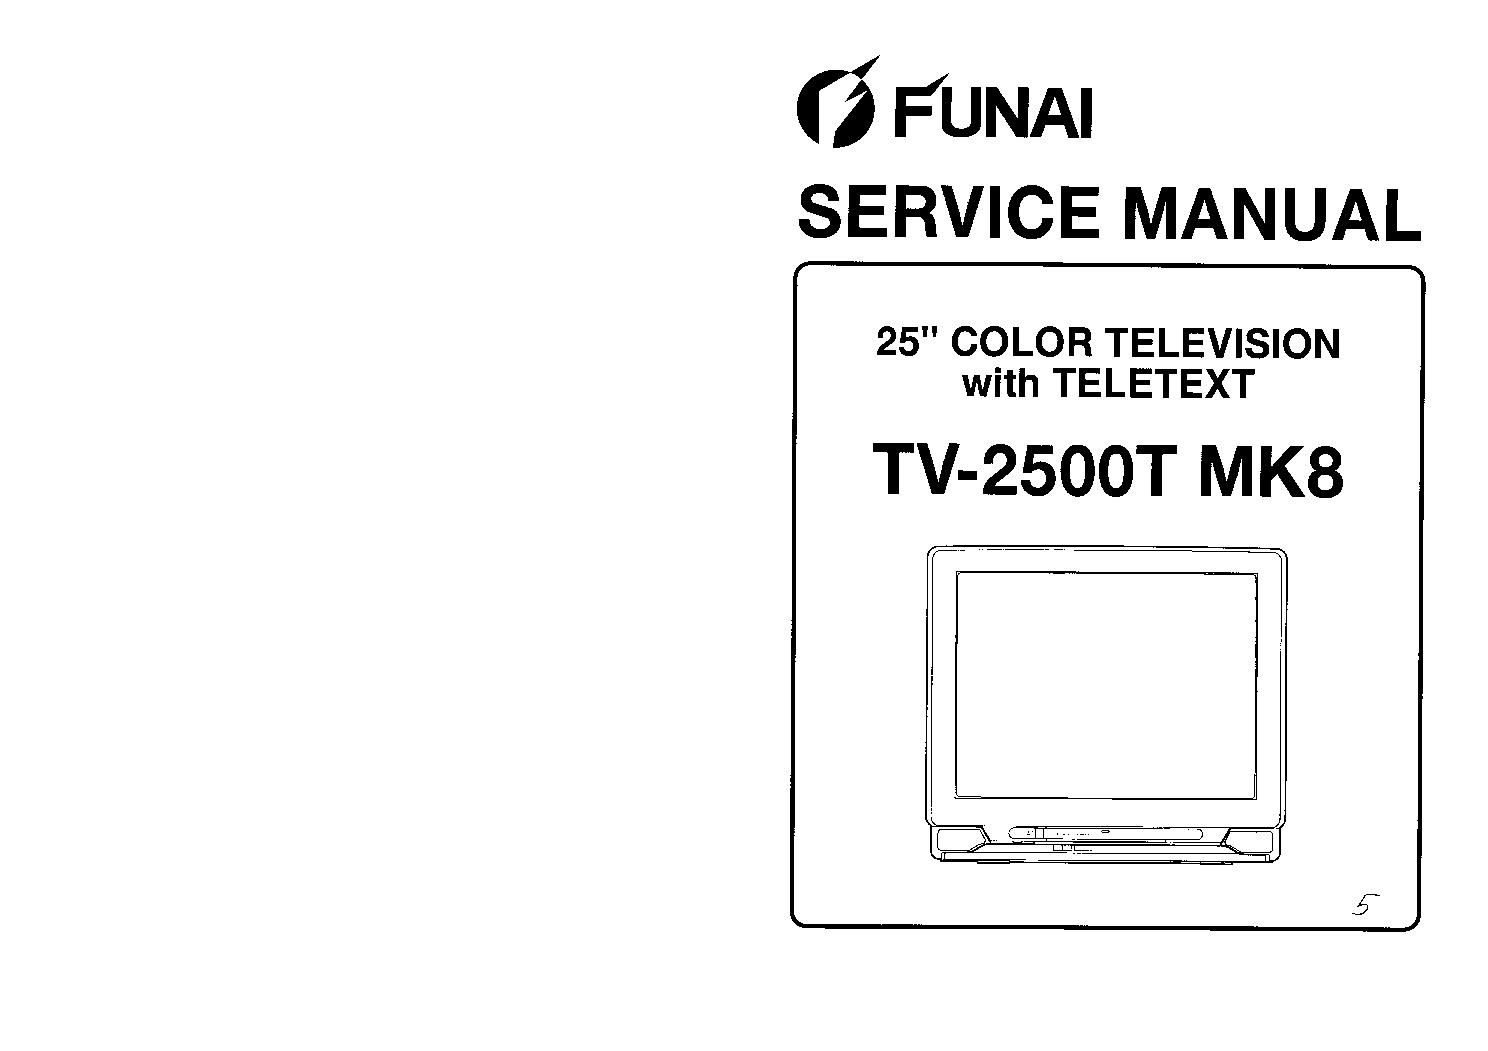 FUNAI TV2500T MK8 SM